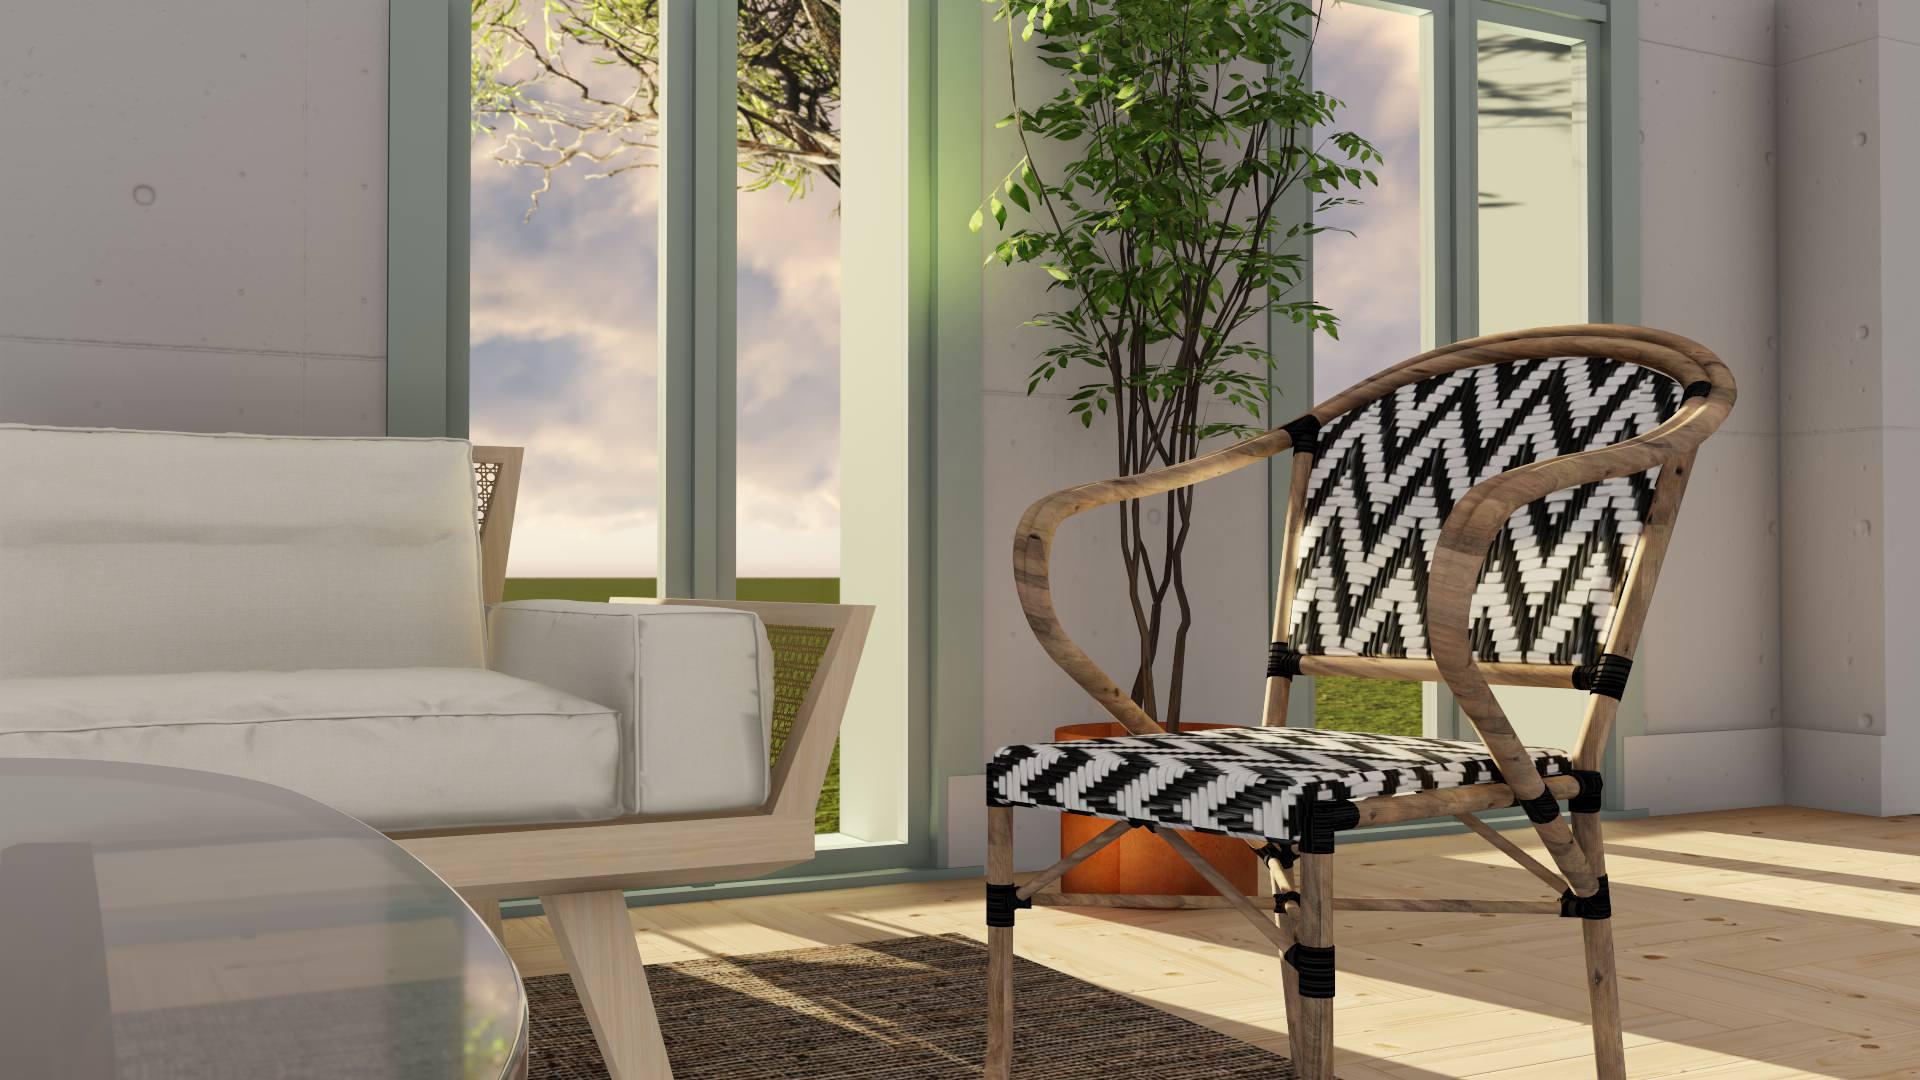 Diseño interior vivienda unifamiliar